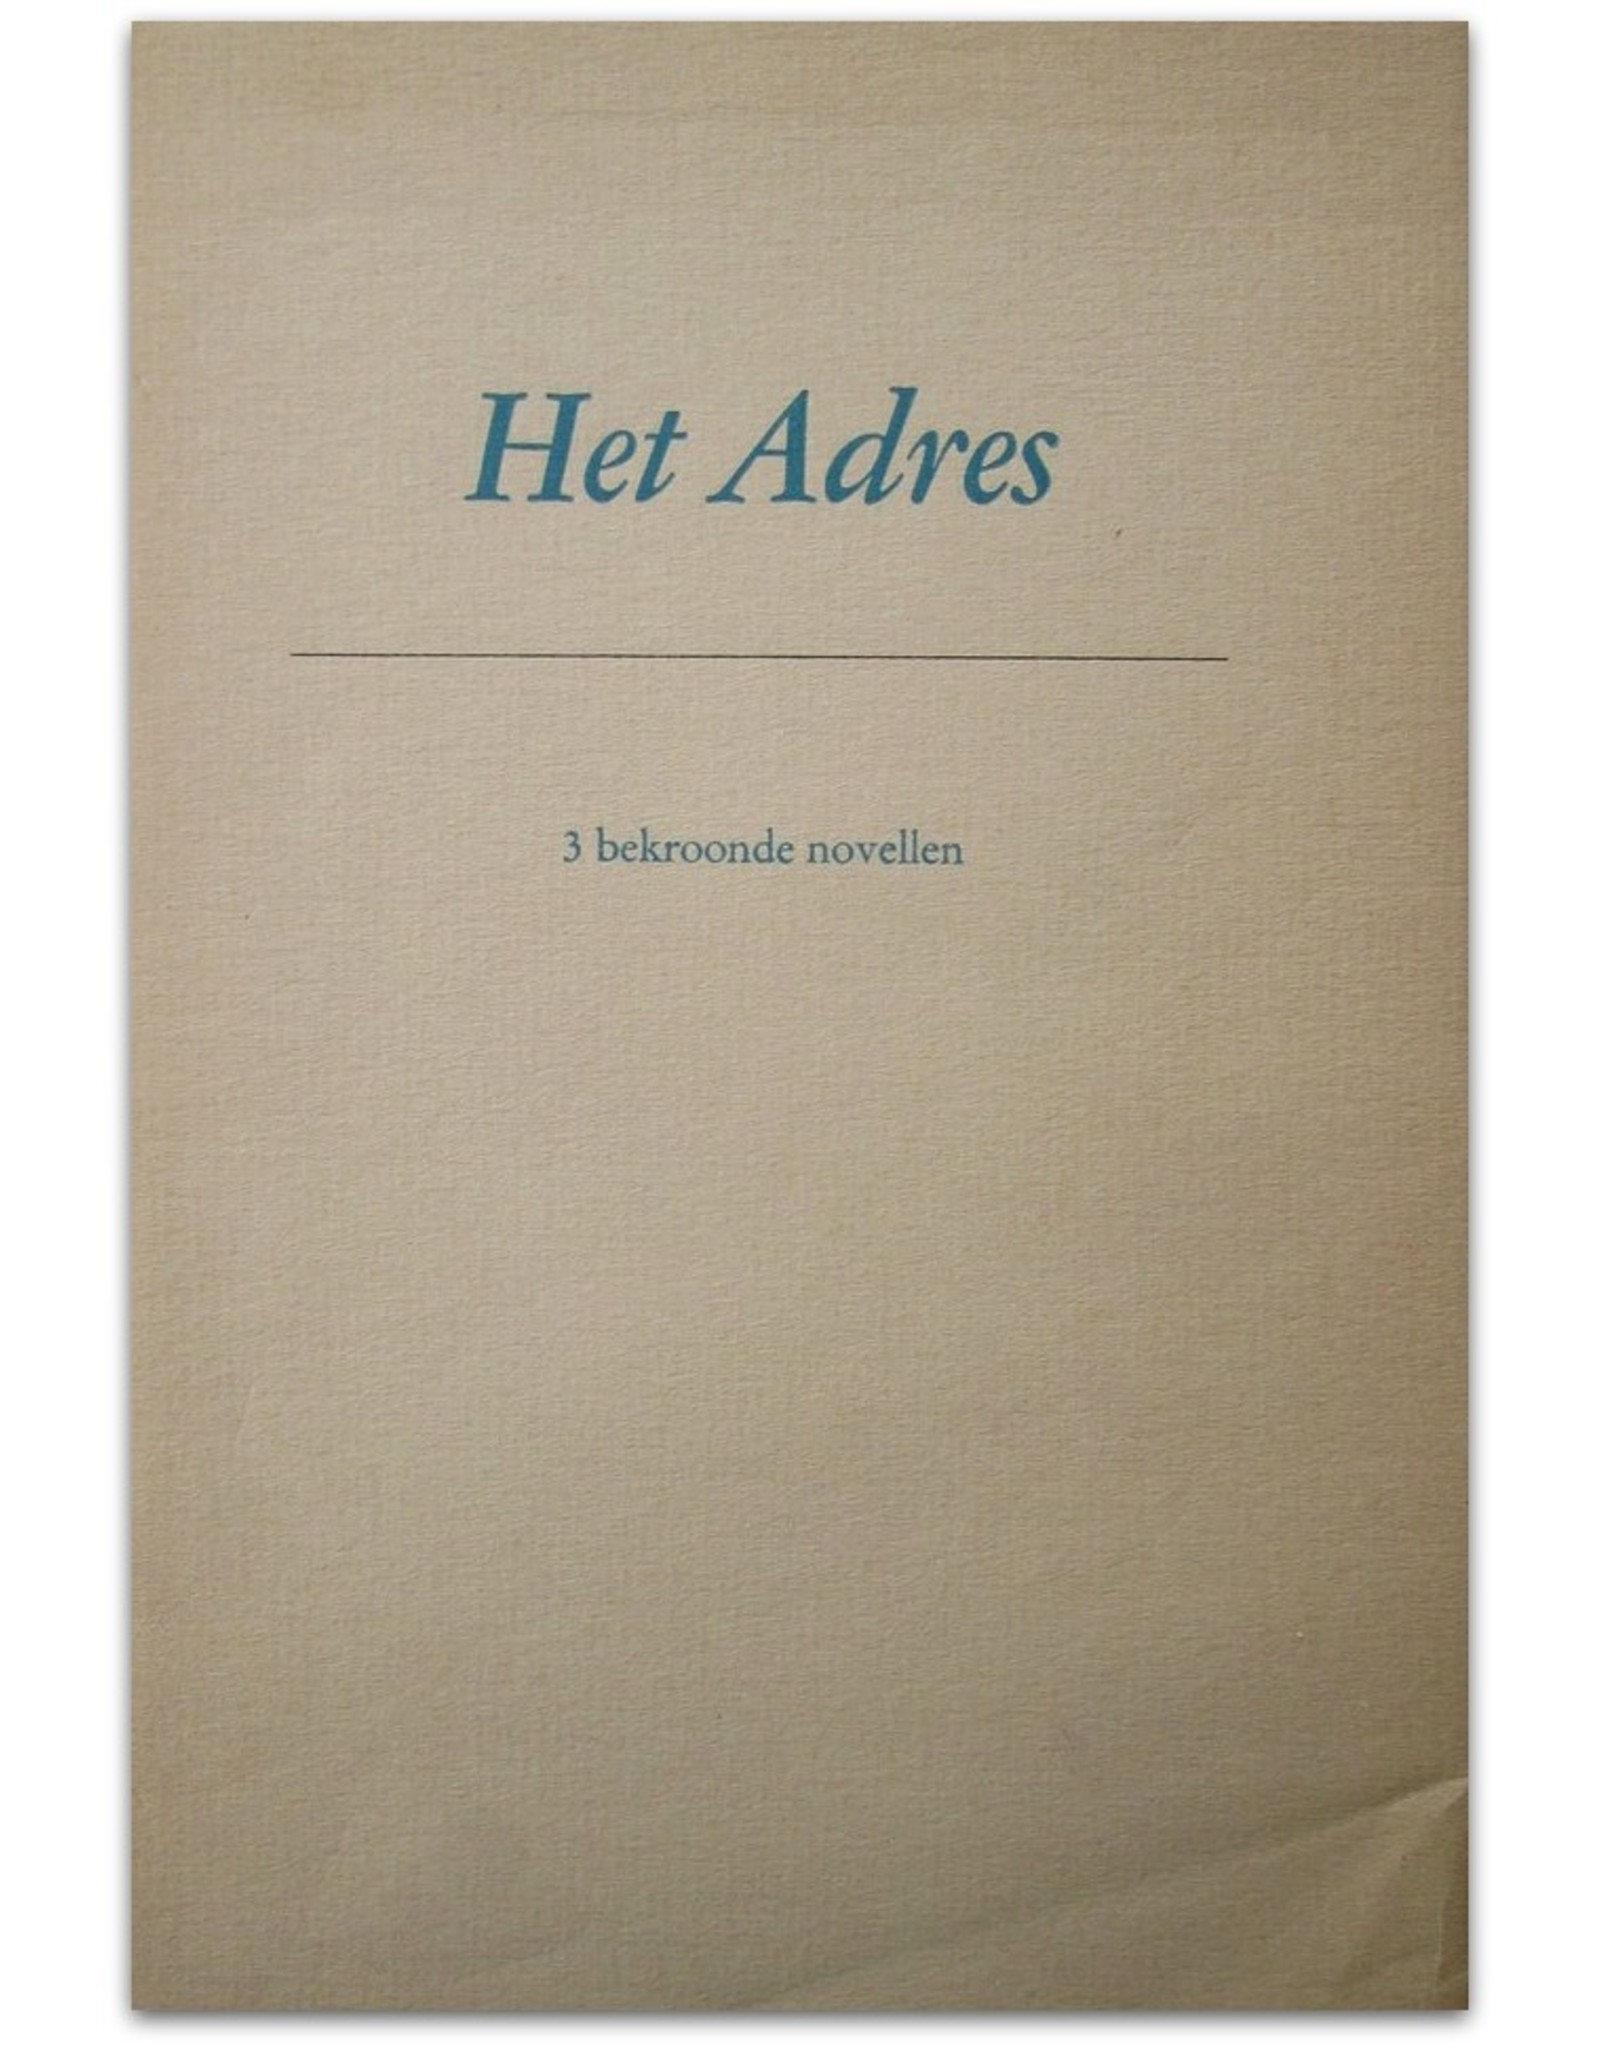 Marga Minco - Het Adres. 3 bekroonde novellen